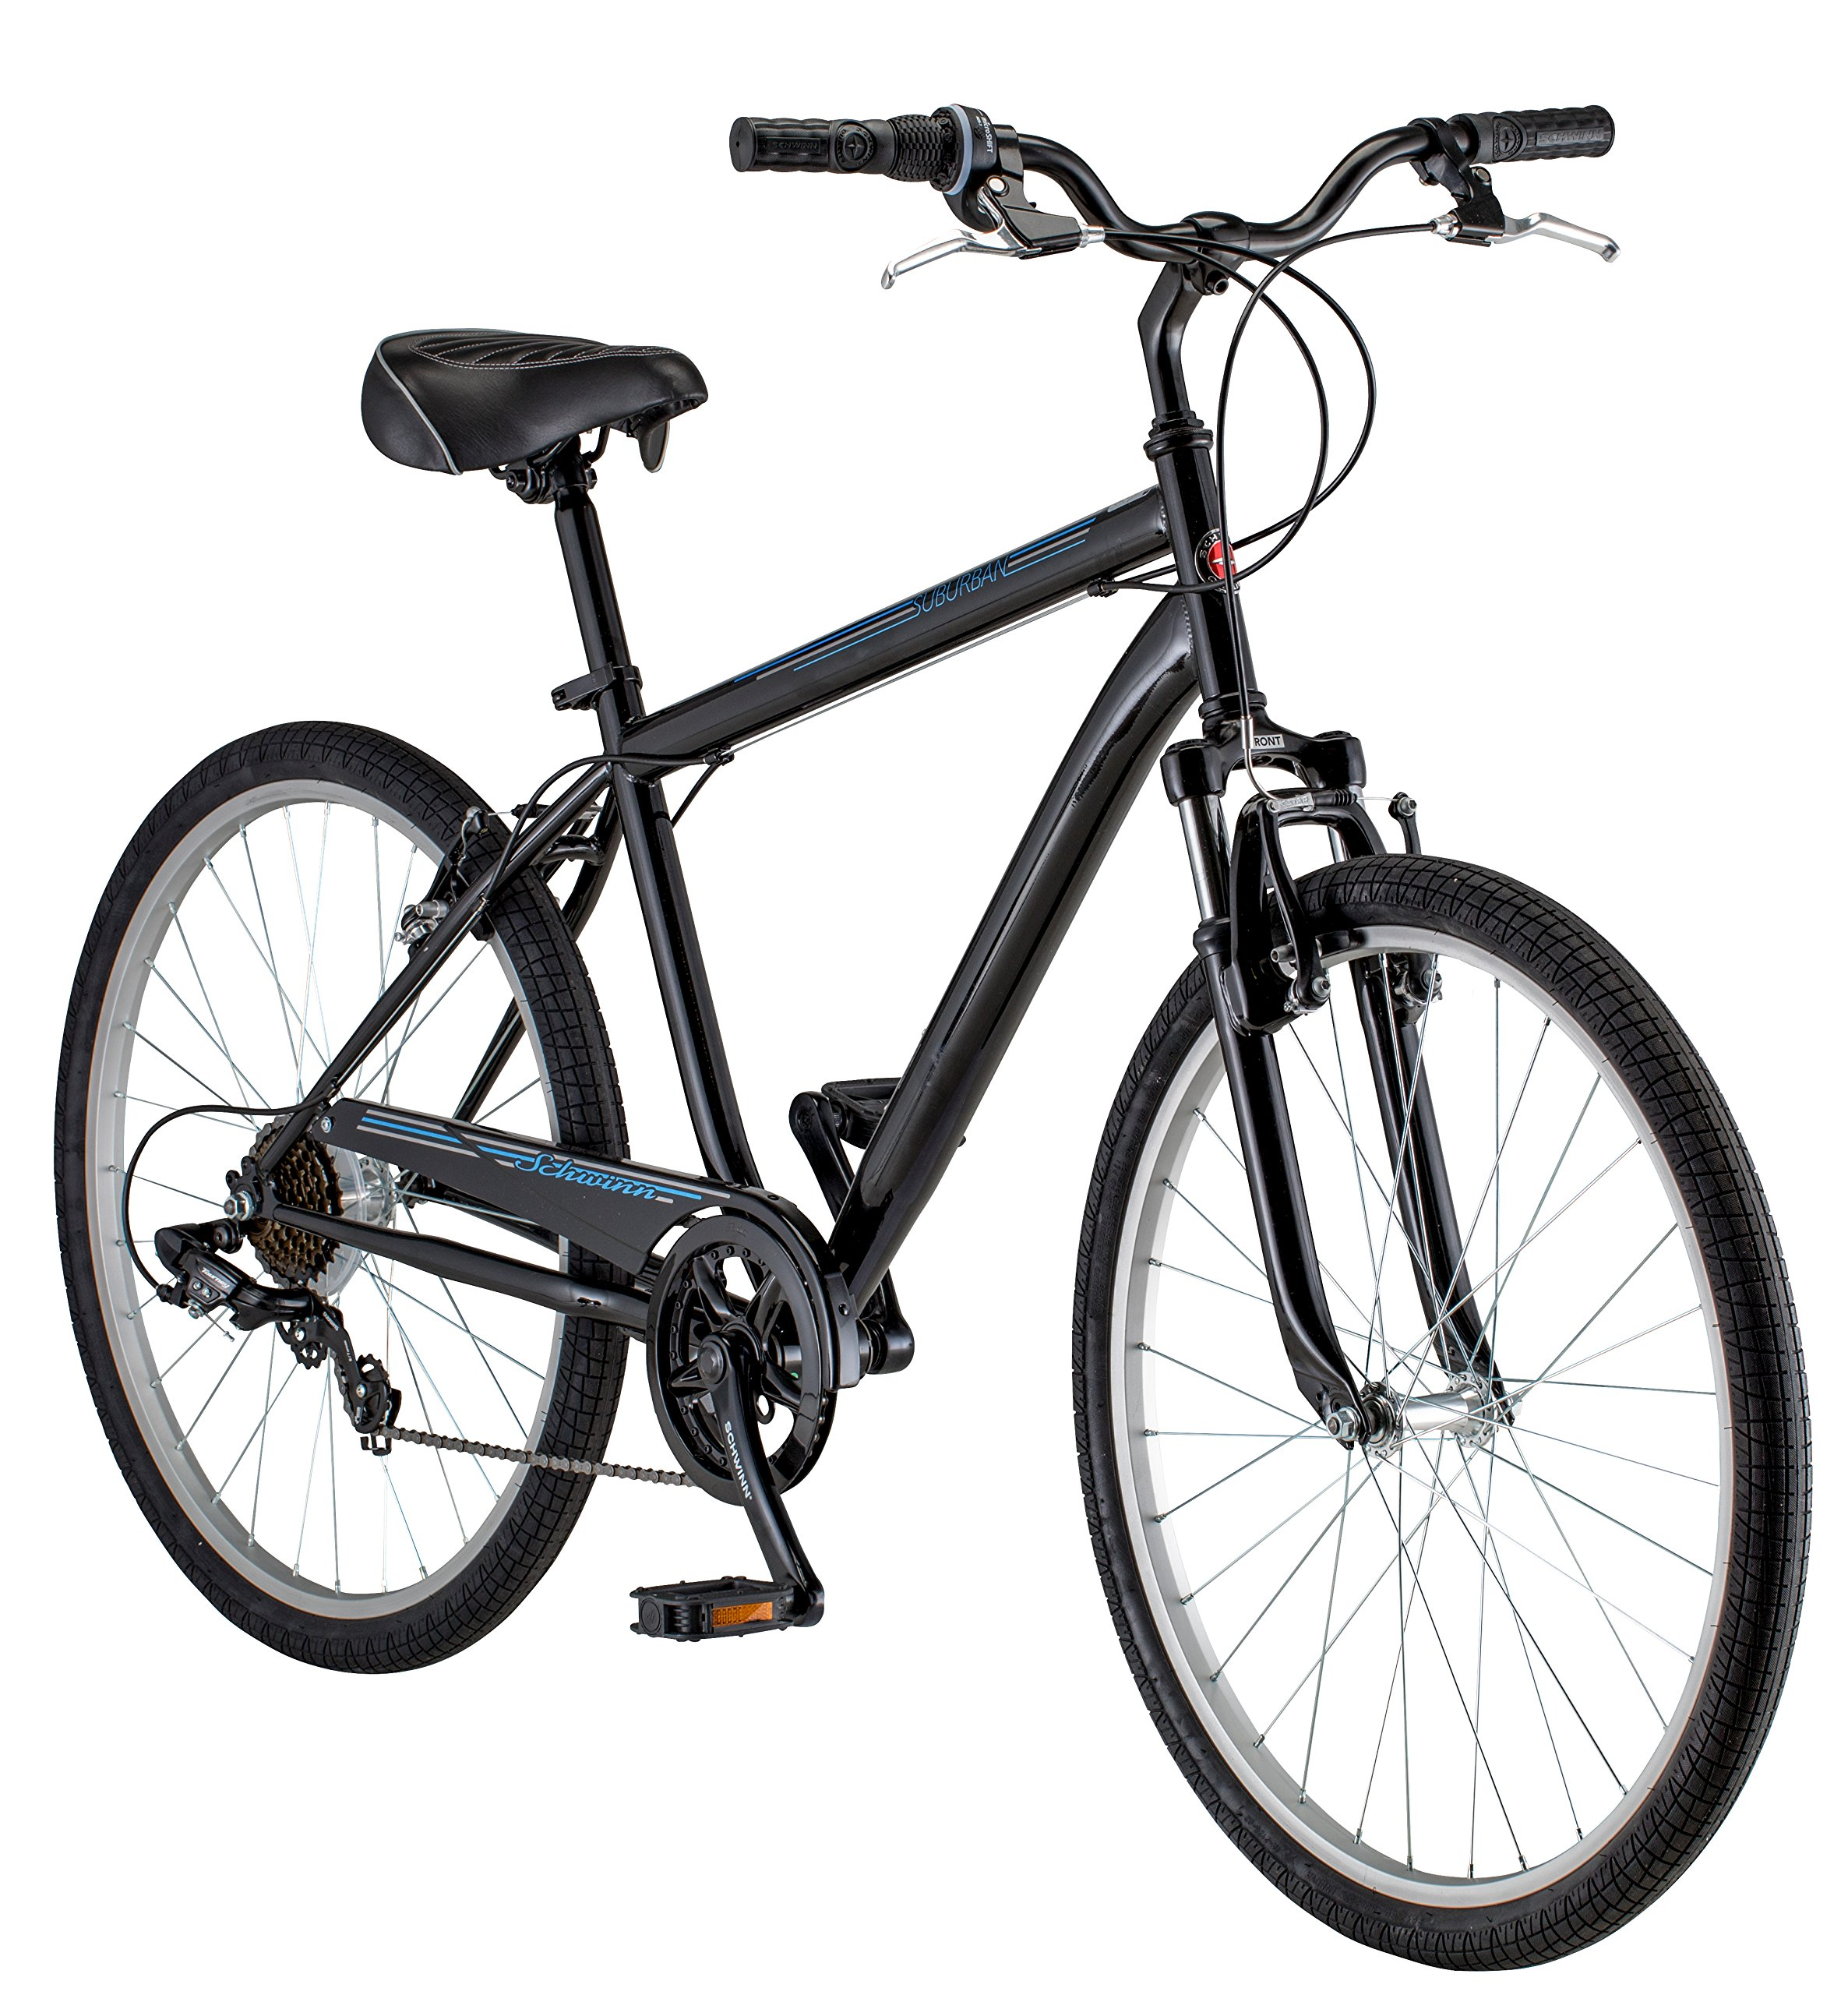 Schwinn Men's Suburban Bike, 26-Inch, Black